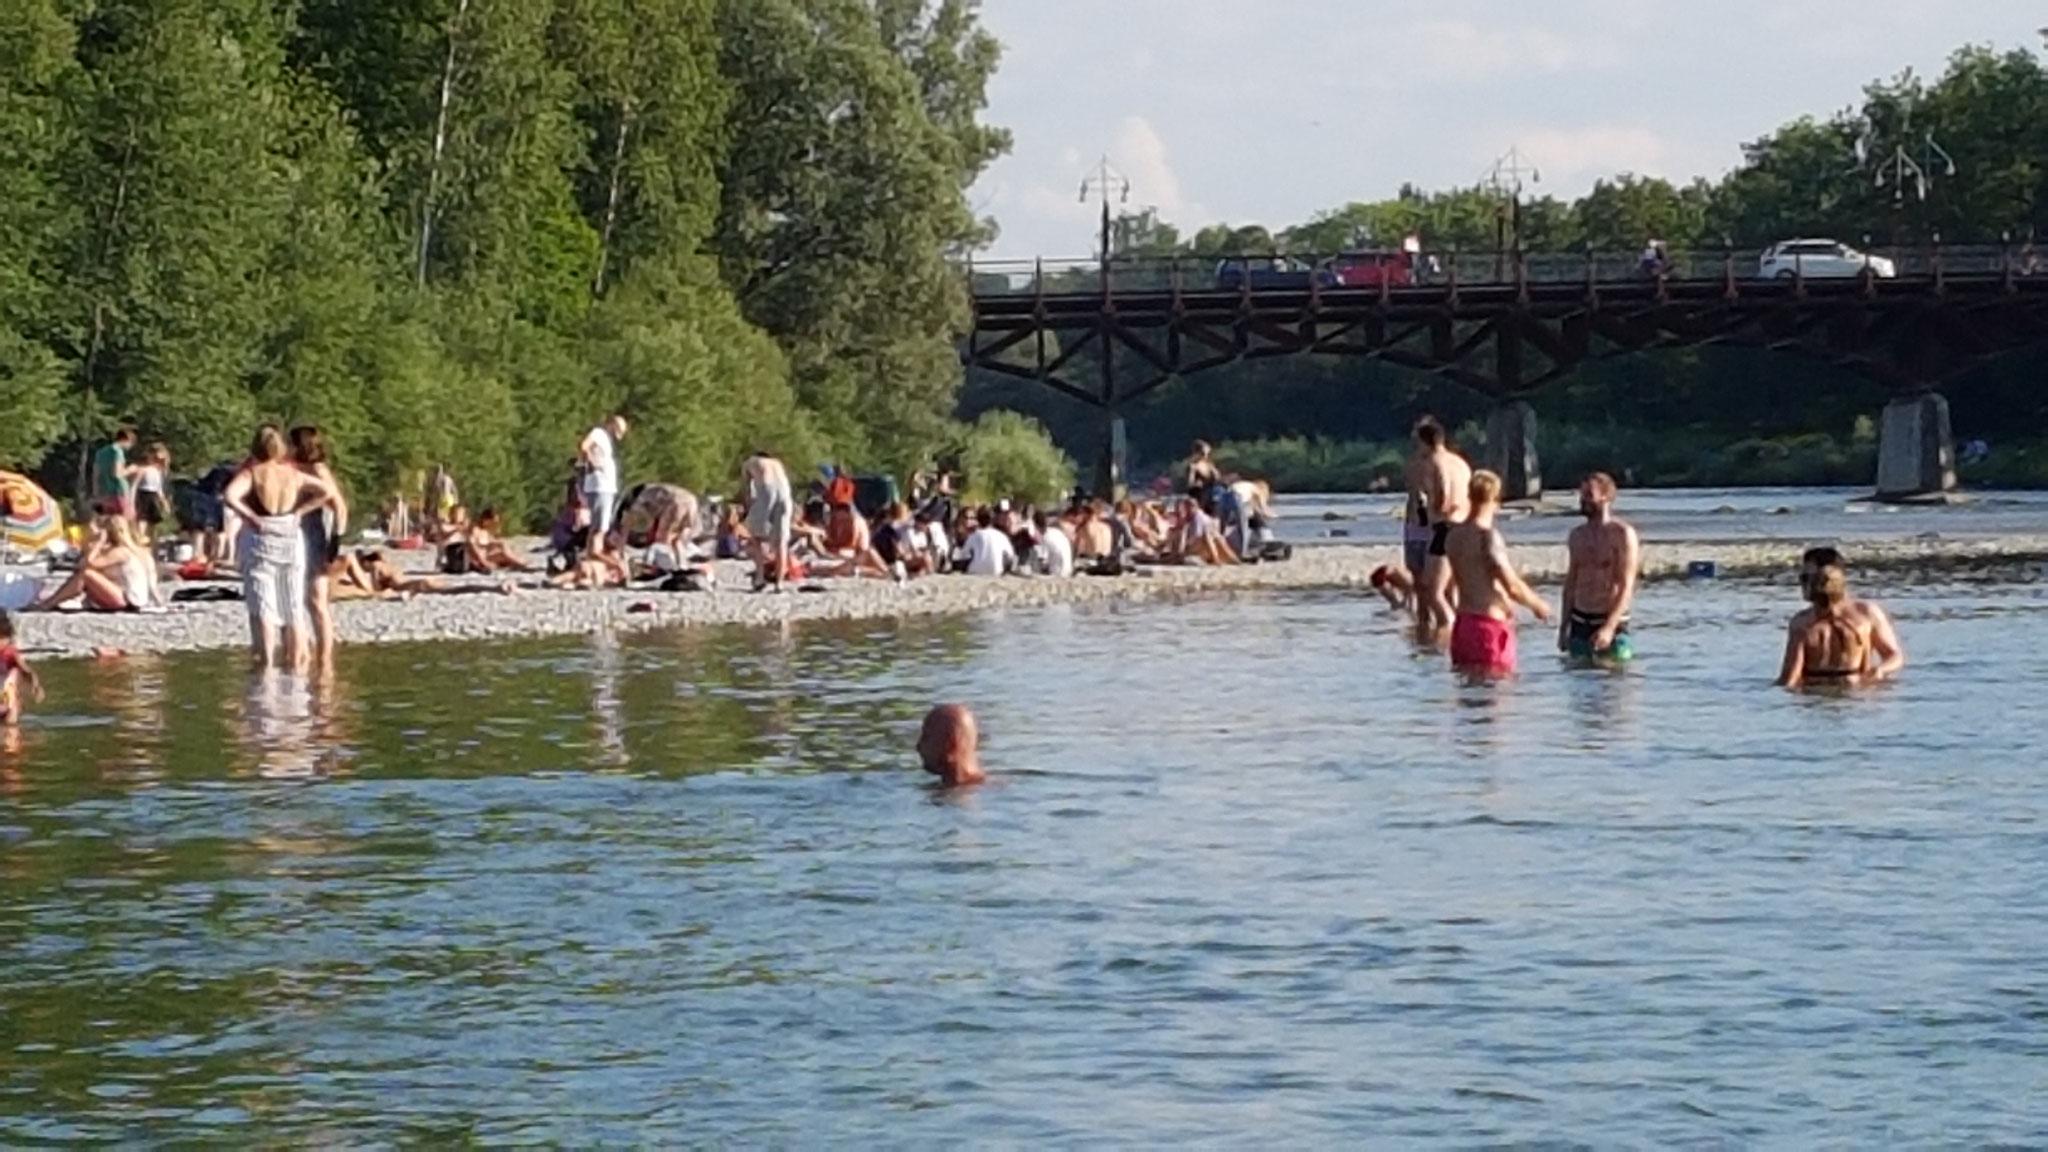 per U3 nach Thalkirchen: Aufpumpen an der Tierparkbrücke